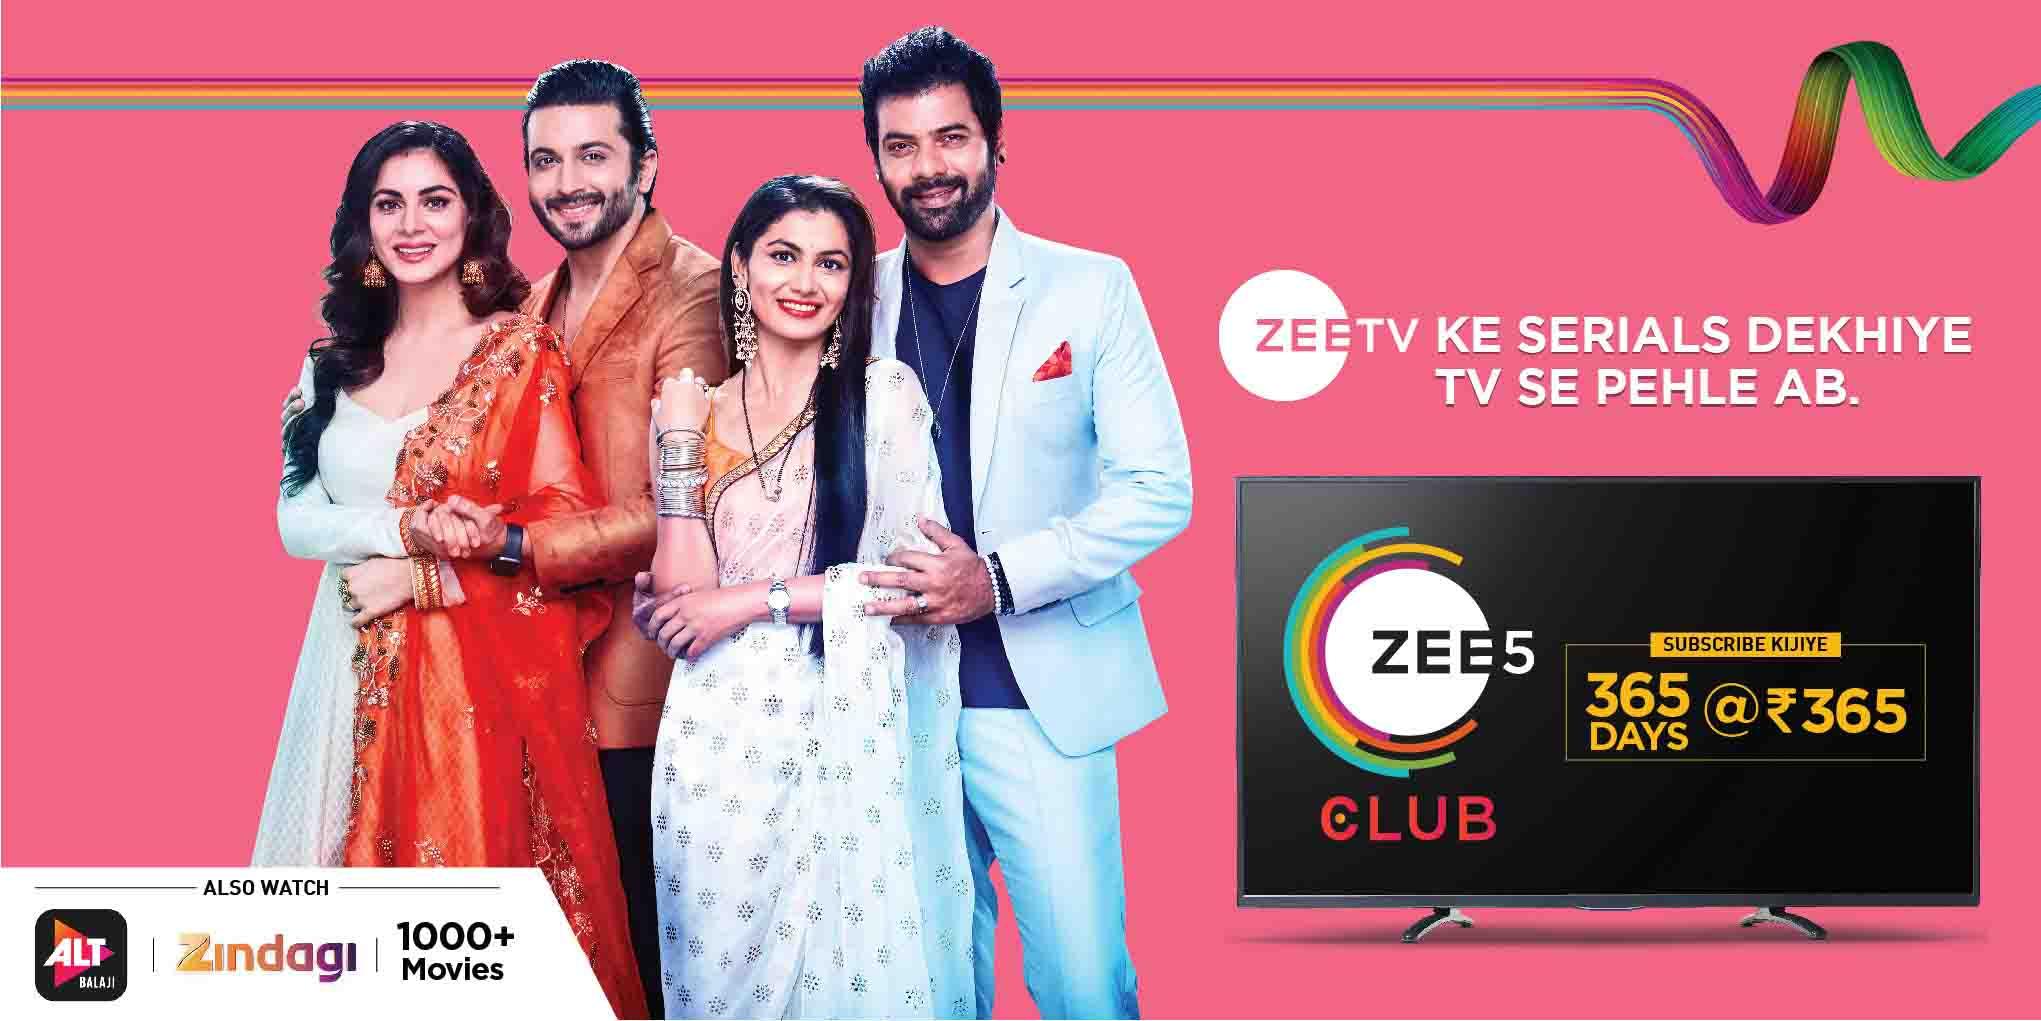 ZEE5 Club 1